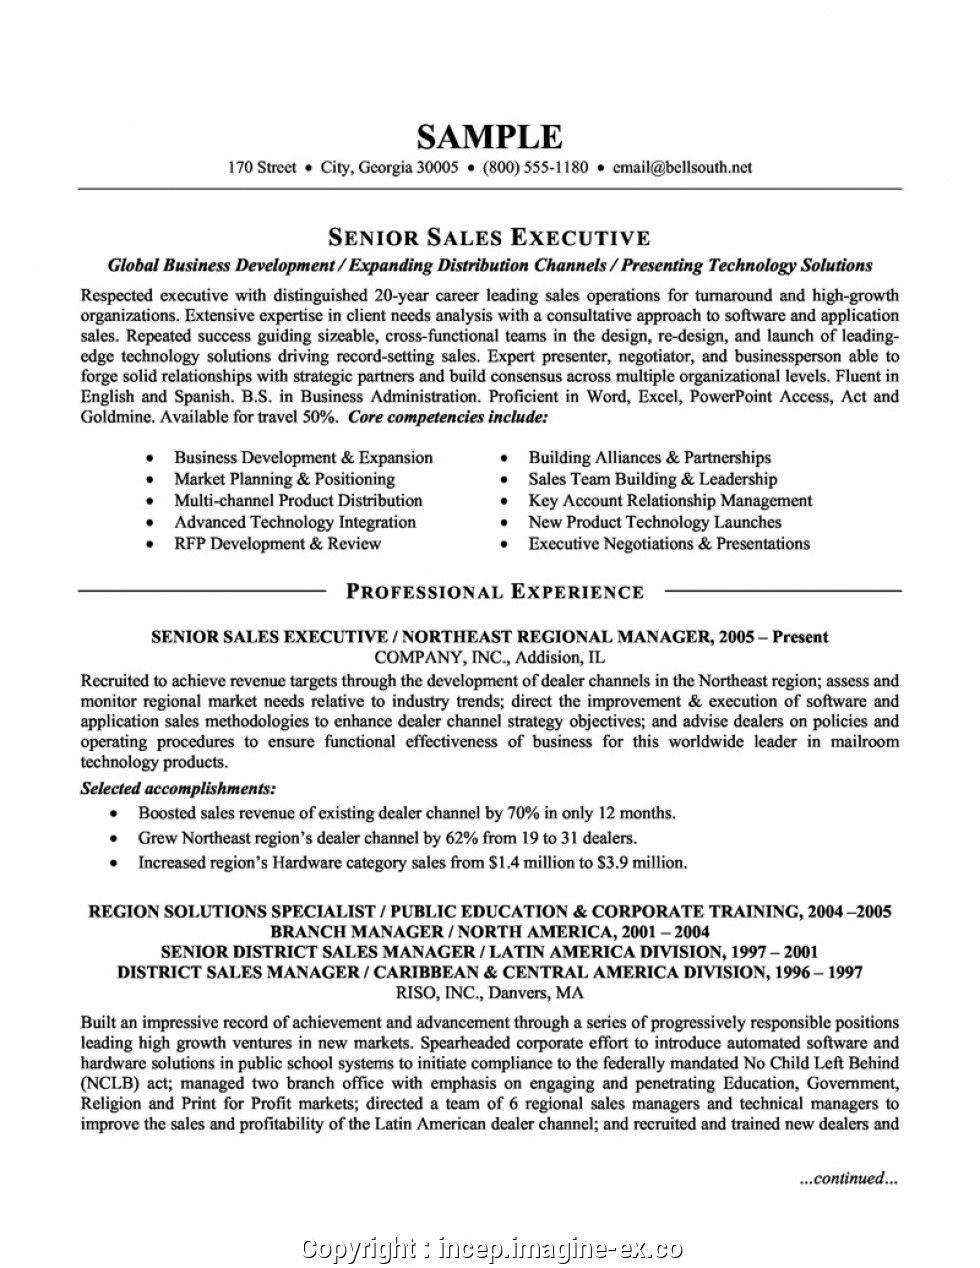 Senior Sales Executive Sample Resume Senior Sales Executive